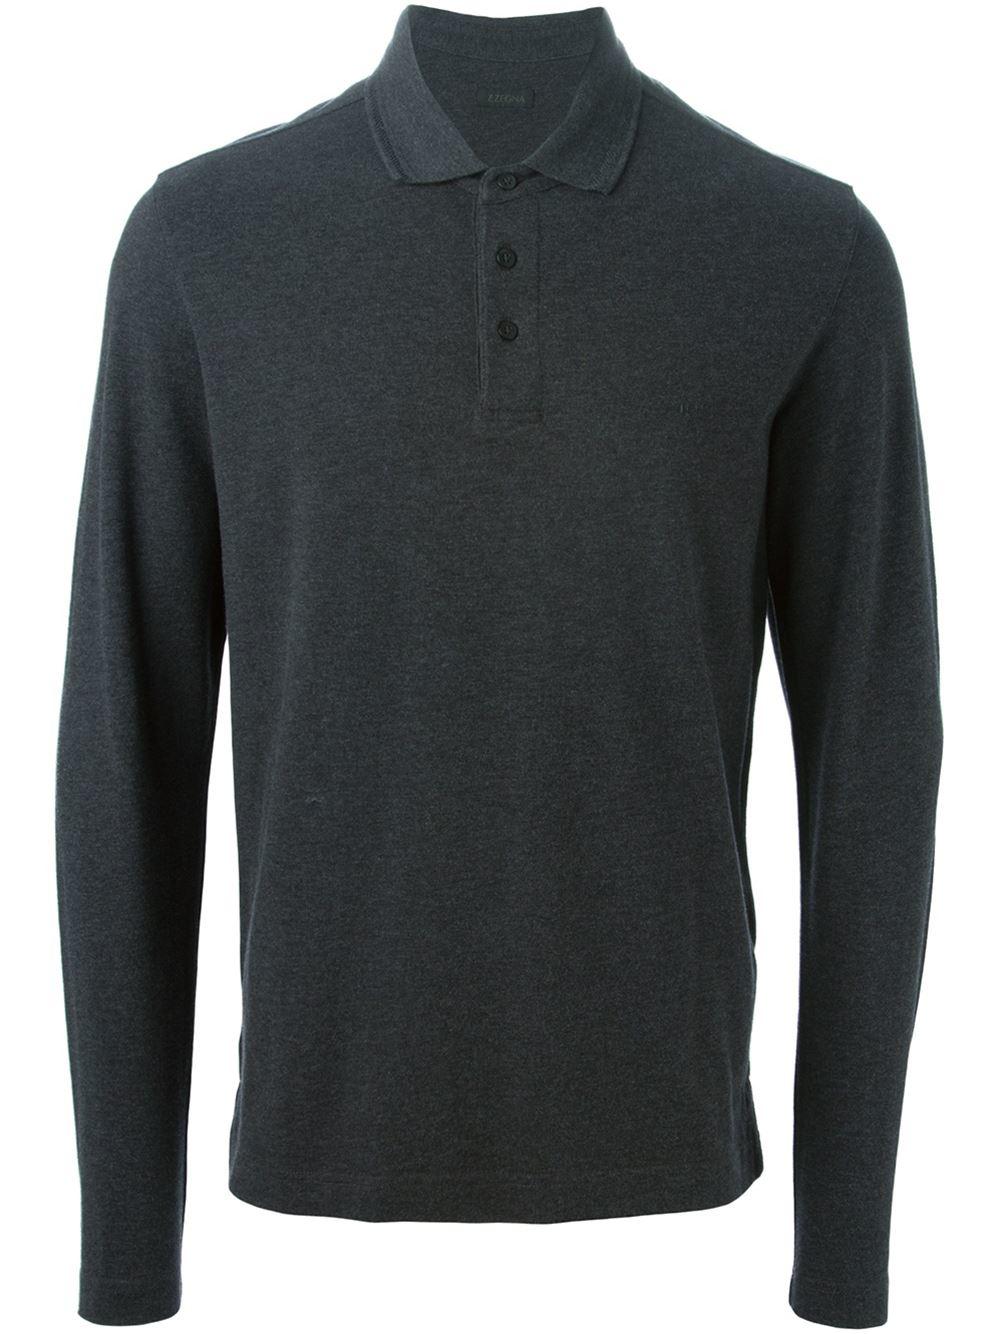 Z zegna long sleeve polo shirt in gray for men grey lyst for Grey long sleeve shirts